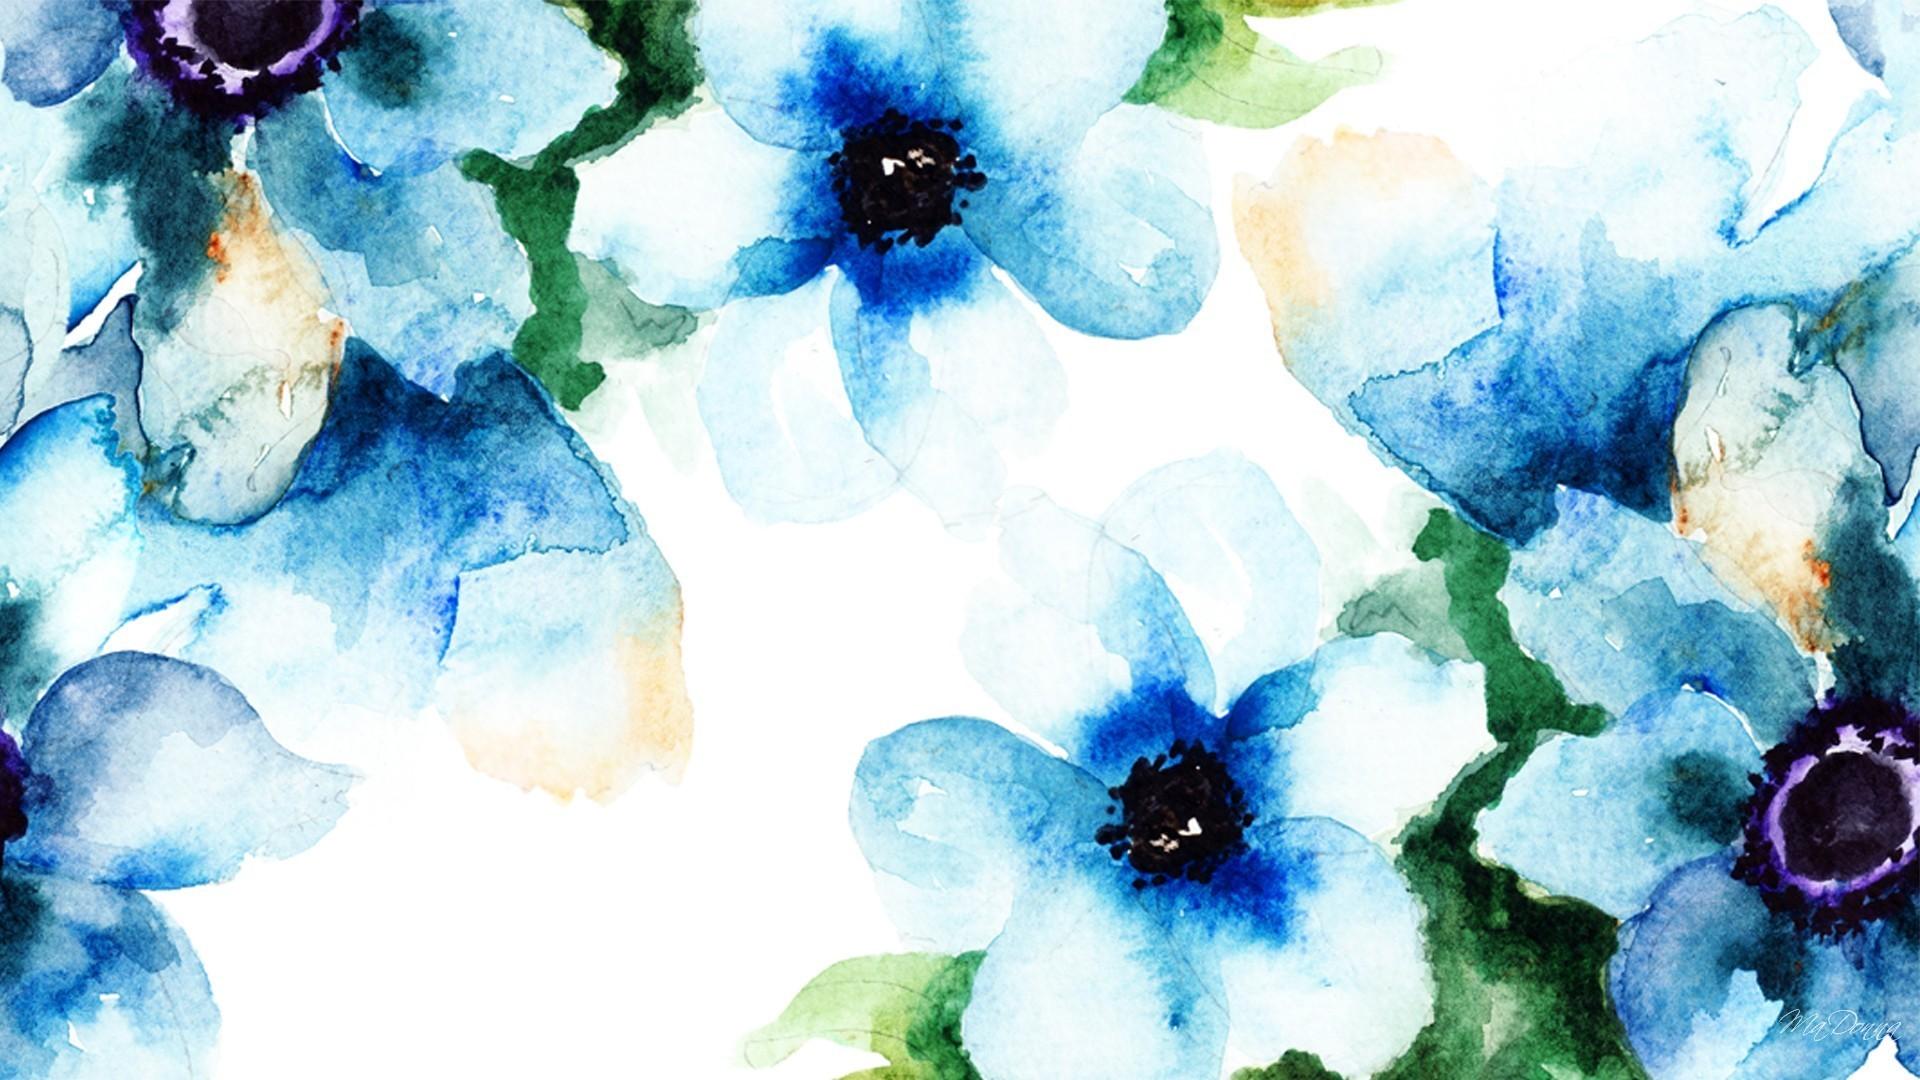 Watercolor Wallpaper For Desktop 59 Images